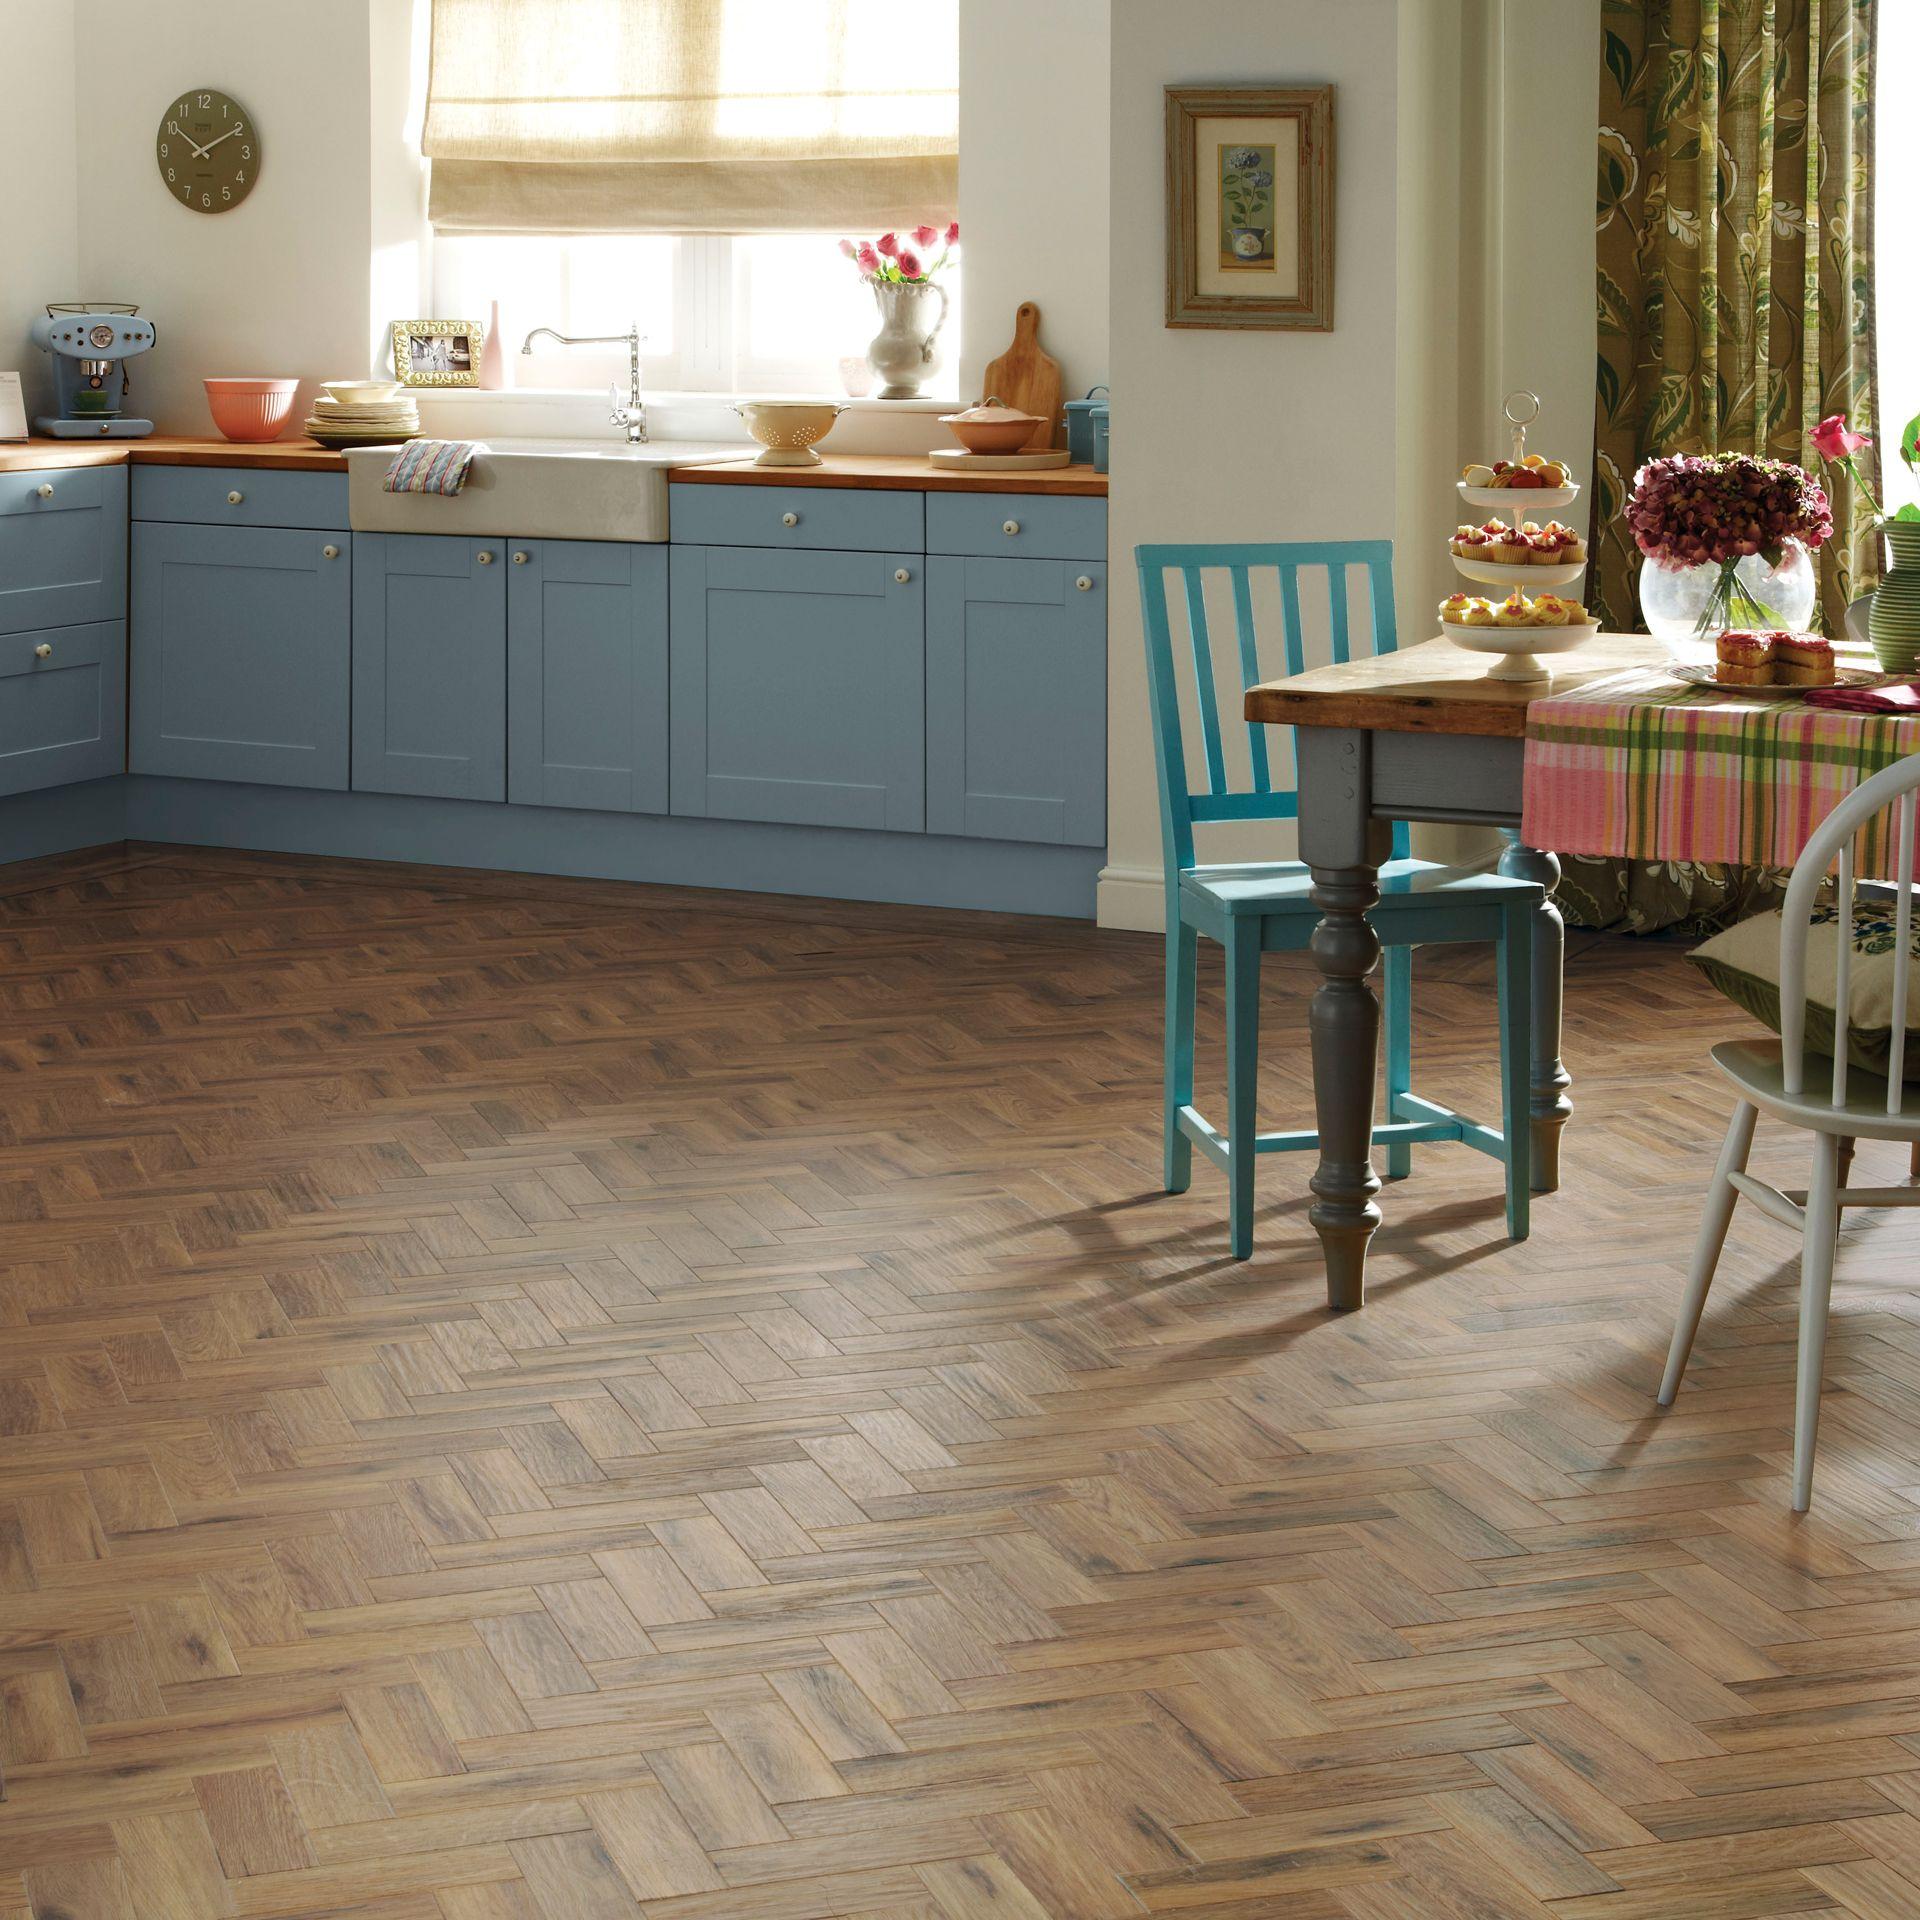 Karndean Art Select Ap06 Morning Oak Parquet  Interior Design Gorgeous Vinyl Flooring Kitchen Inspiration Design